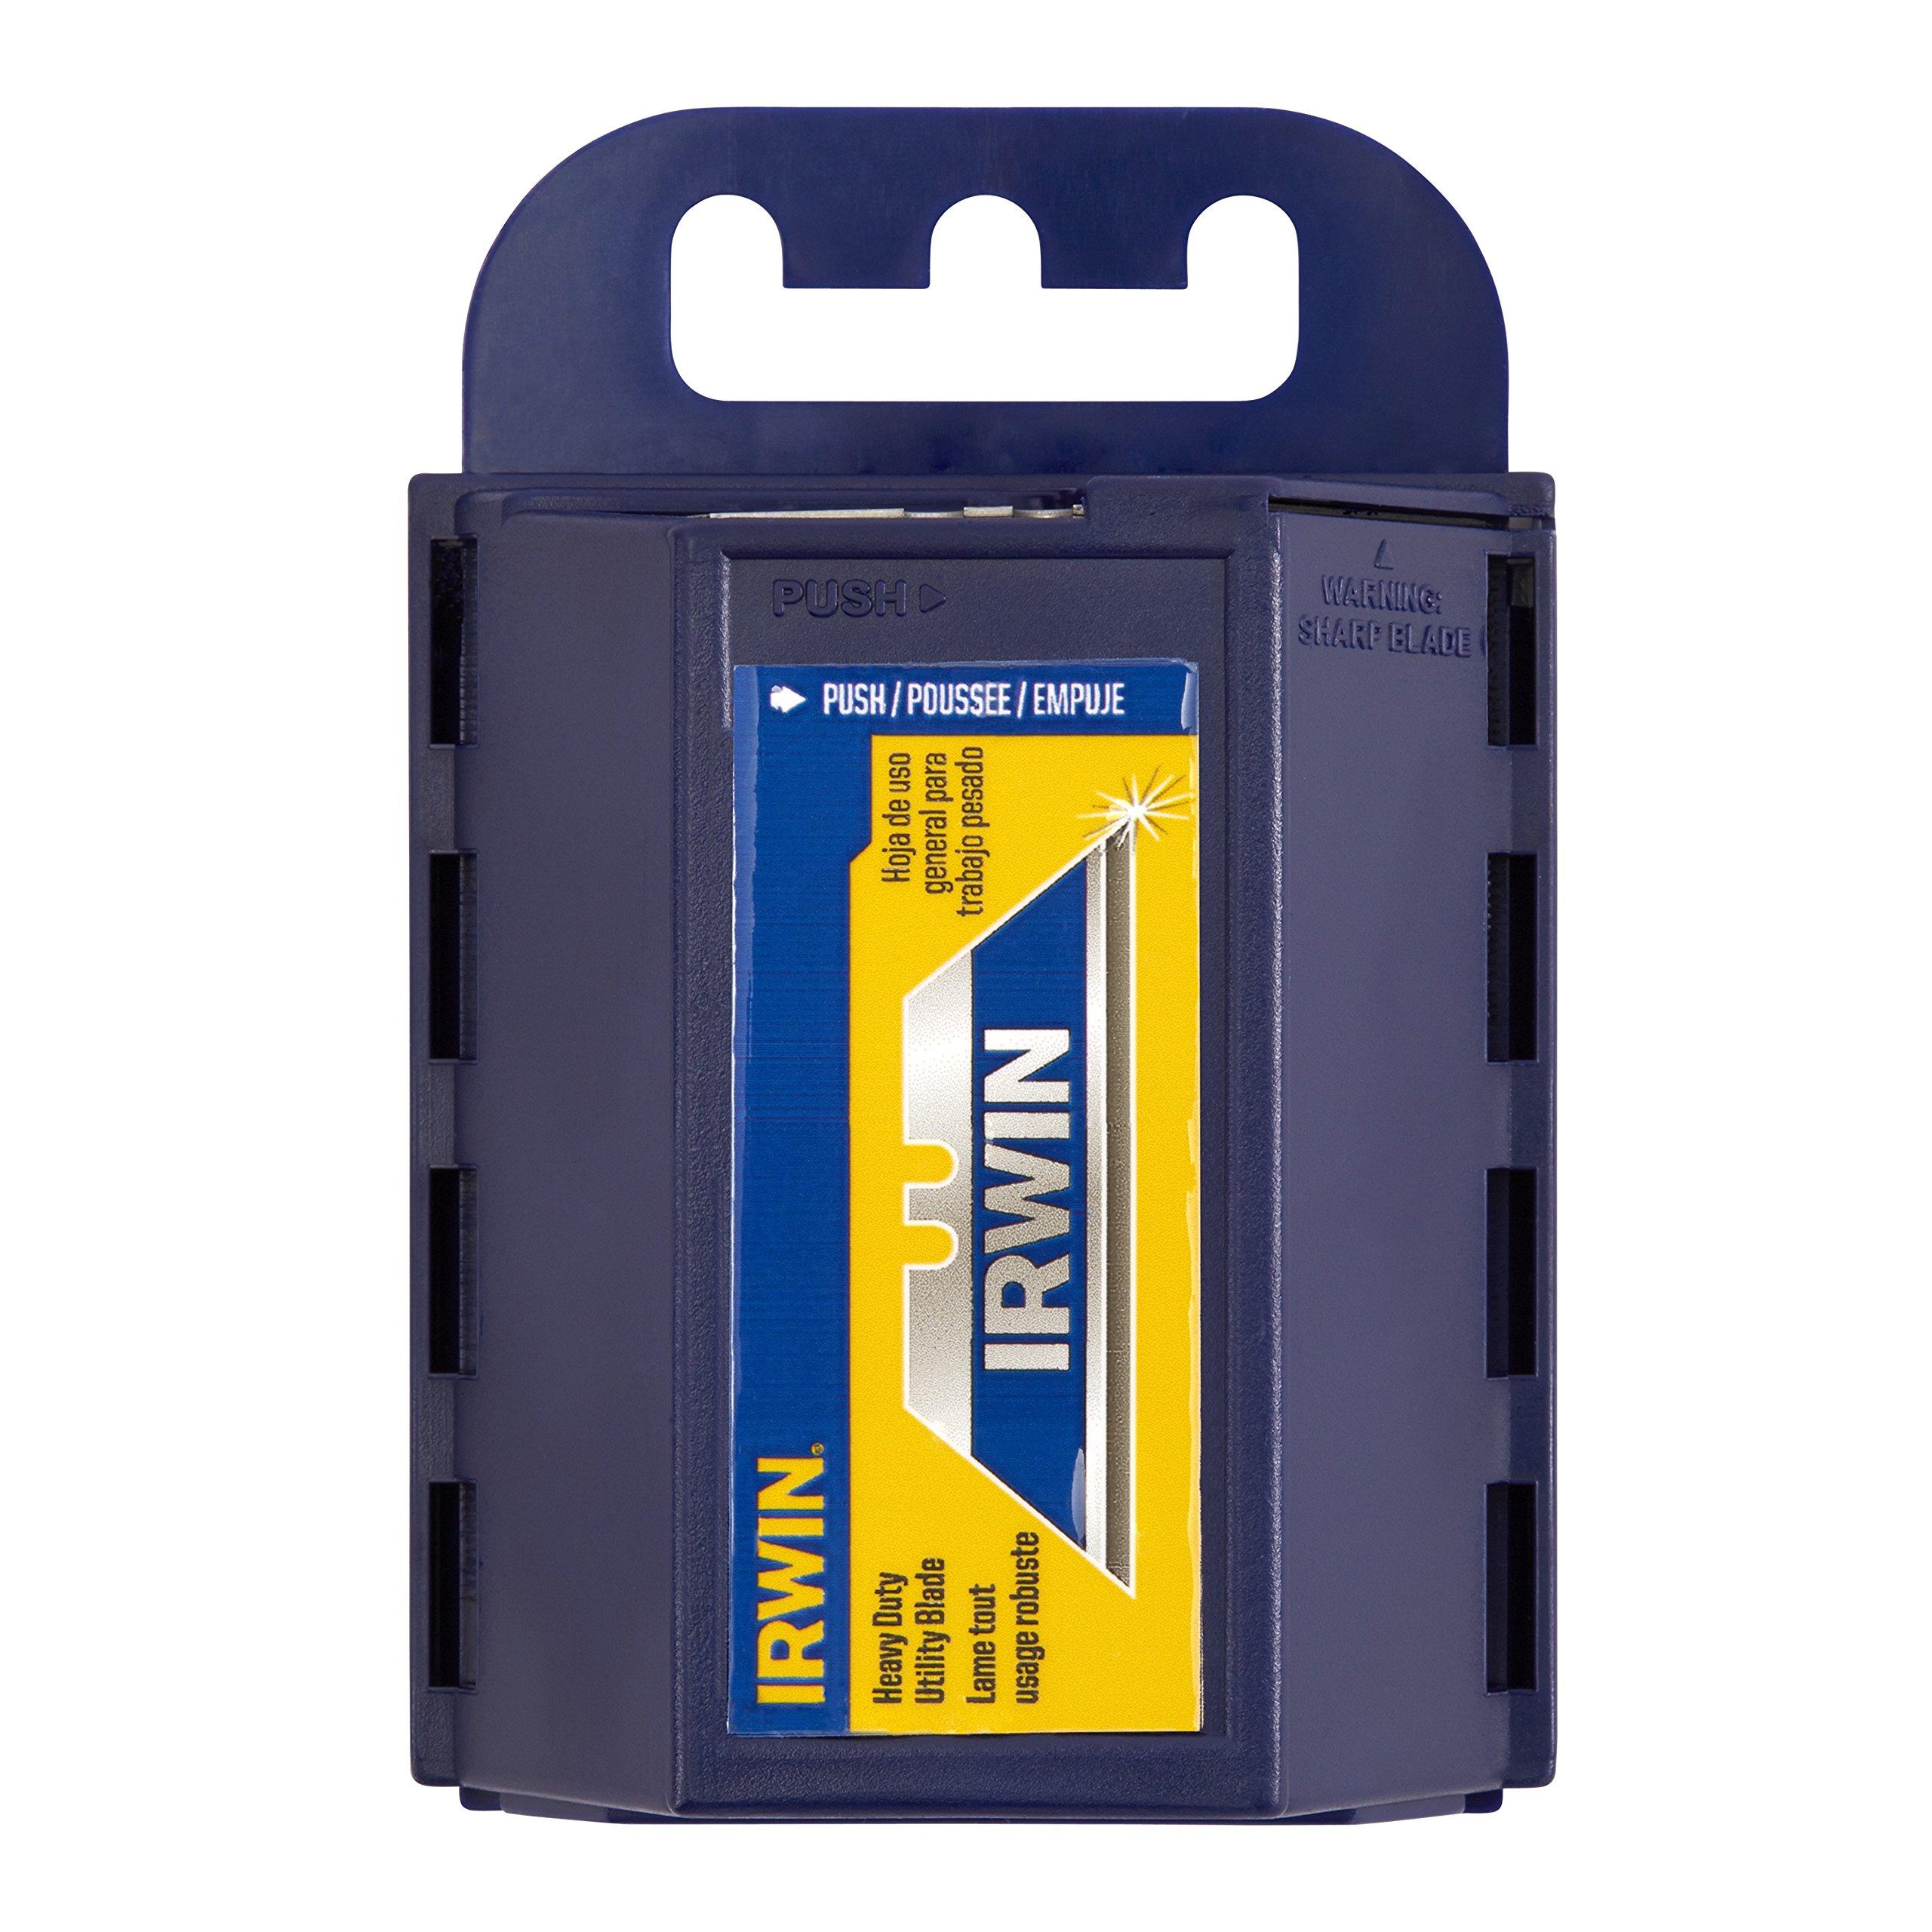 IRWIN Bi-Metal Blue Utility Knife Blades, 100-Pack, 2084400